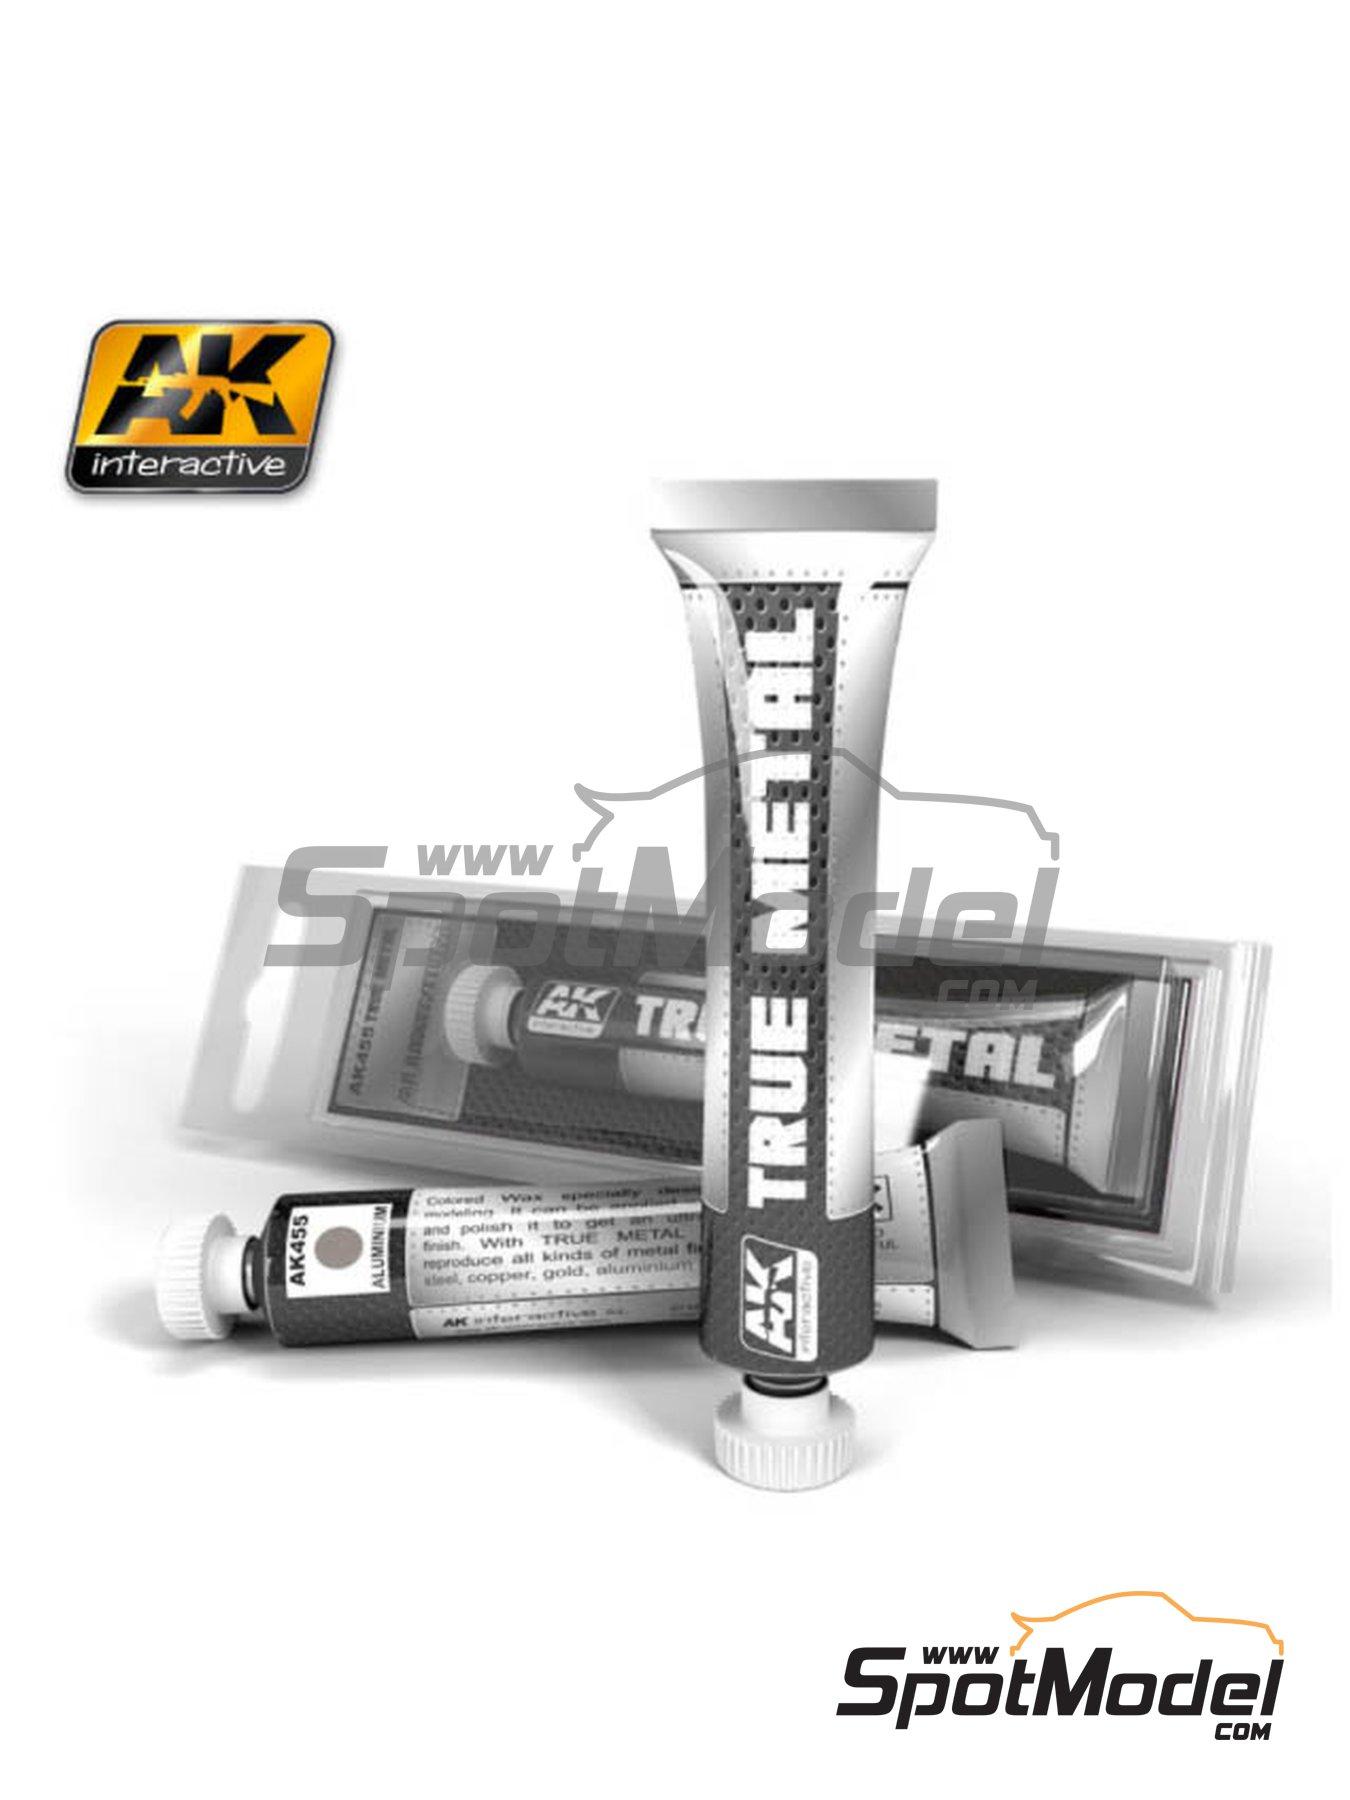 Aluminio | AK True Metal fabricado por AK Interactive (ref.AK-455) image